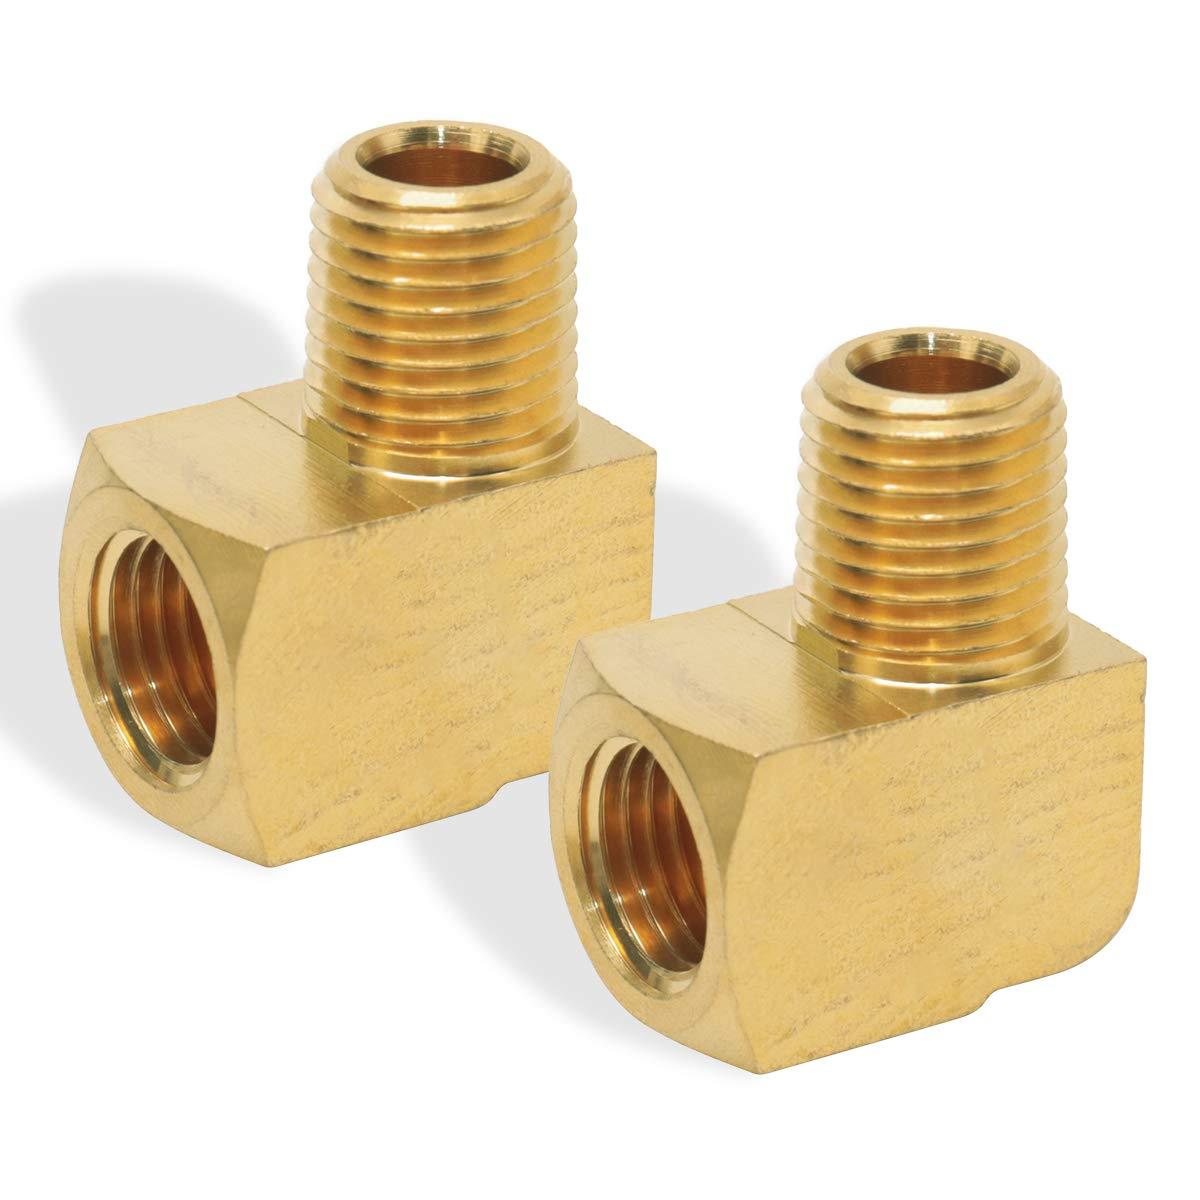 "Boeray 2 pcs Brass Fitting, 1/8"" NPT Male Pipe to 1/8"" NPT Female Pipe 90 Degree Barstock Street Elbow"